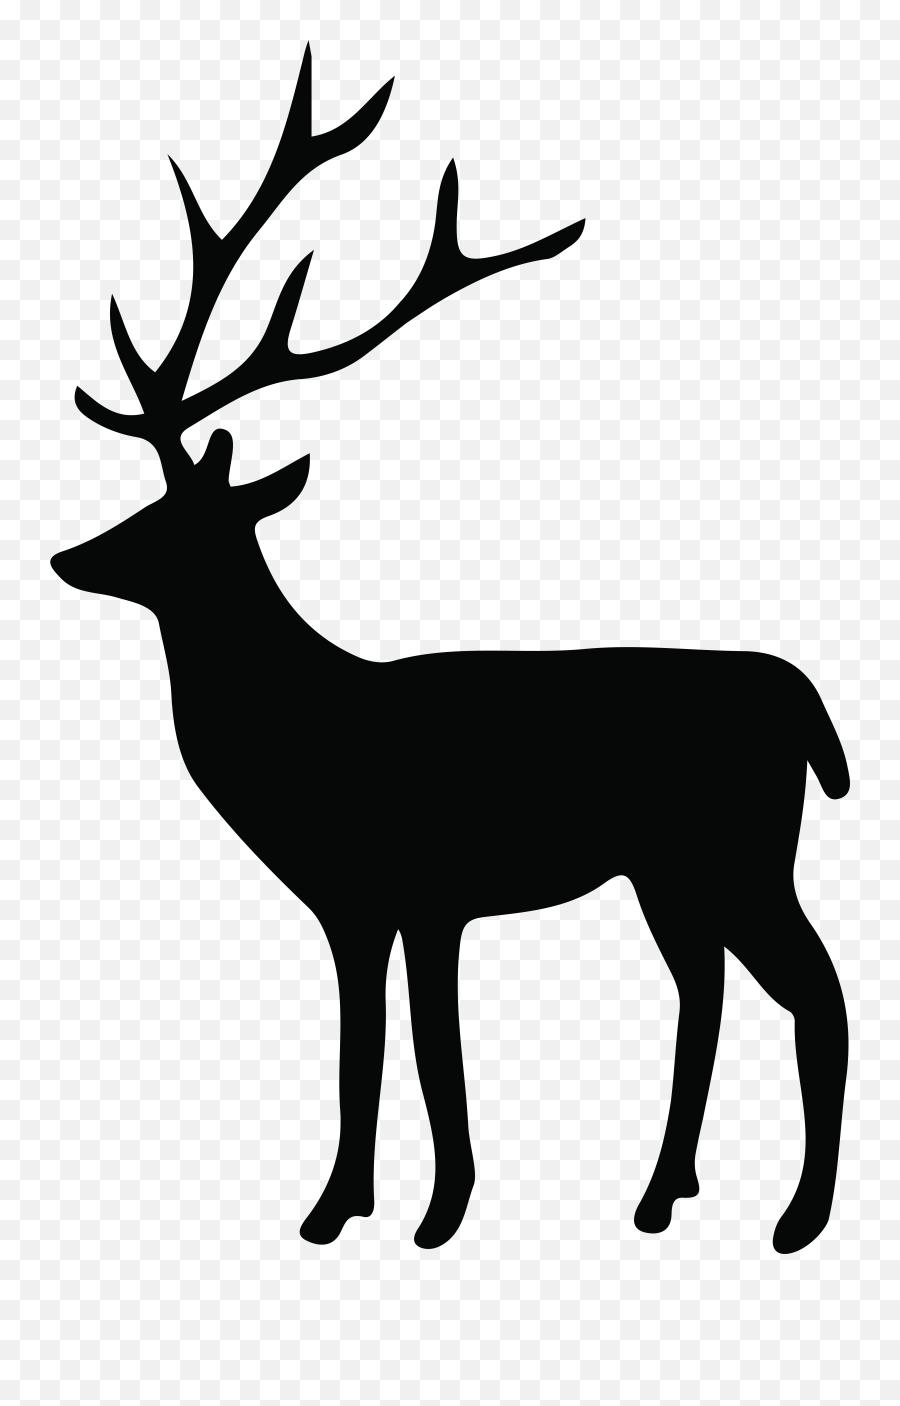 Deer Silhouette Transparent Background - Transparent Deer Silhouette Png Emoji,Deer Hunting Emoji